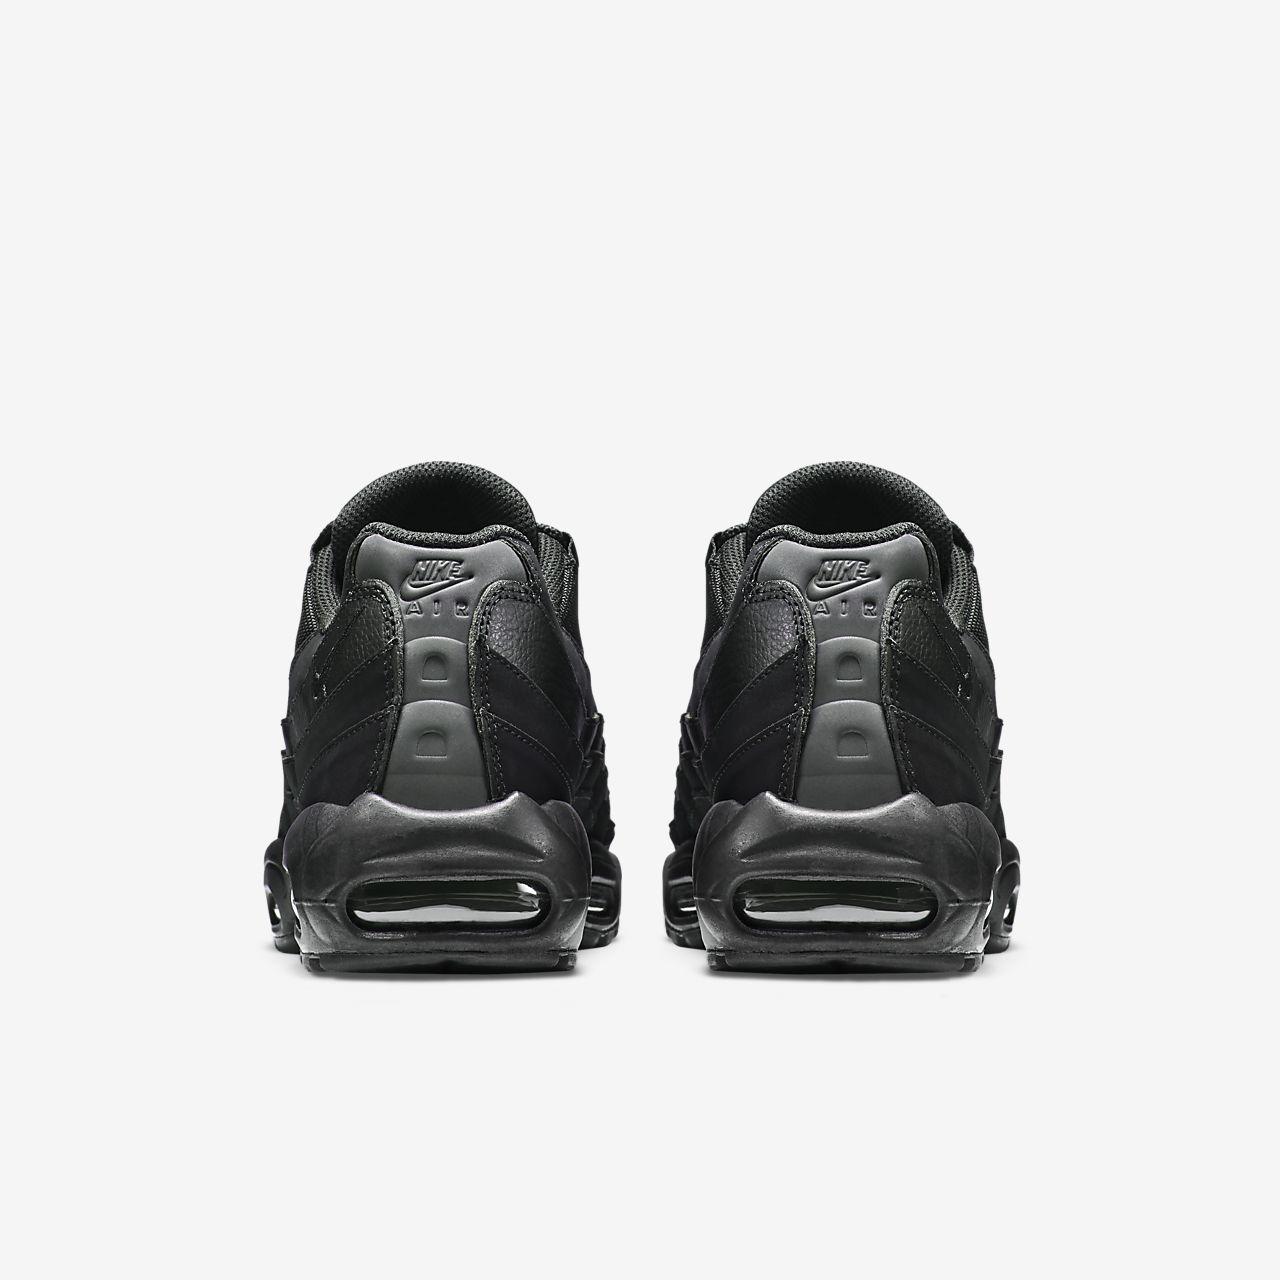 reputable site 203b3 7f2f8 ... Scarpa Nike Air Max 95 - Uomo